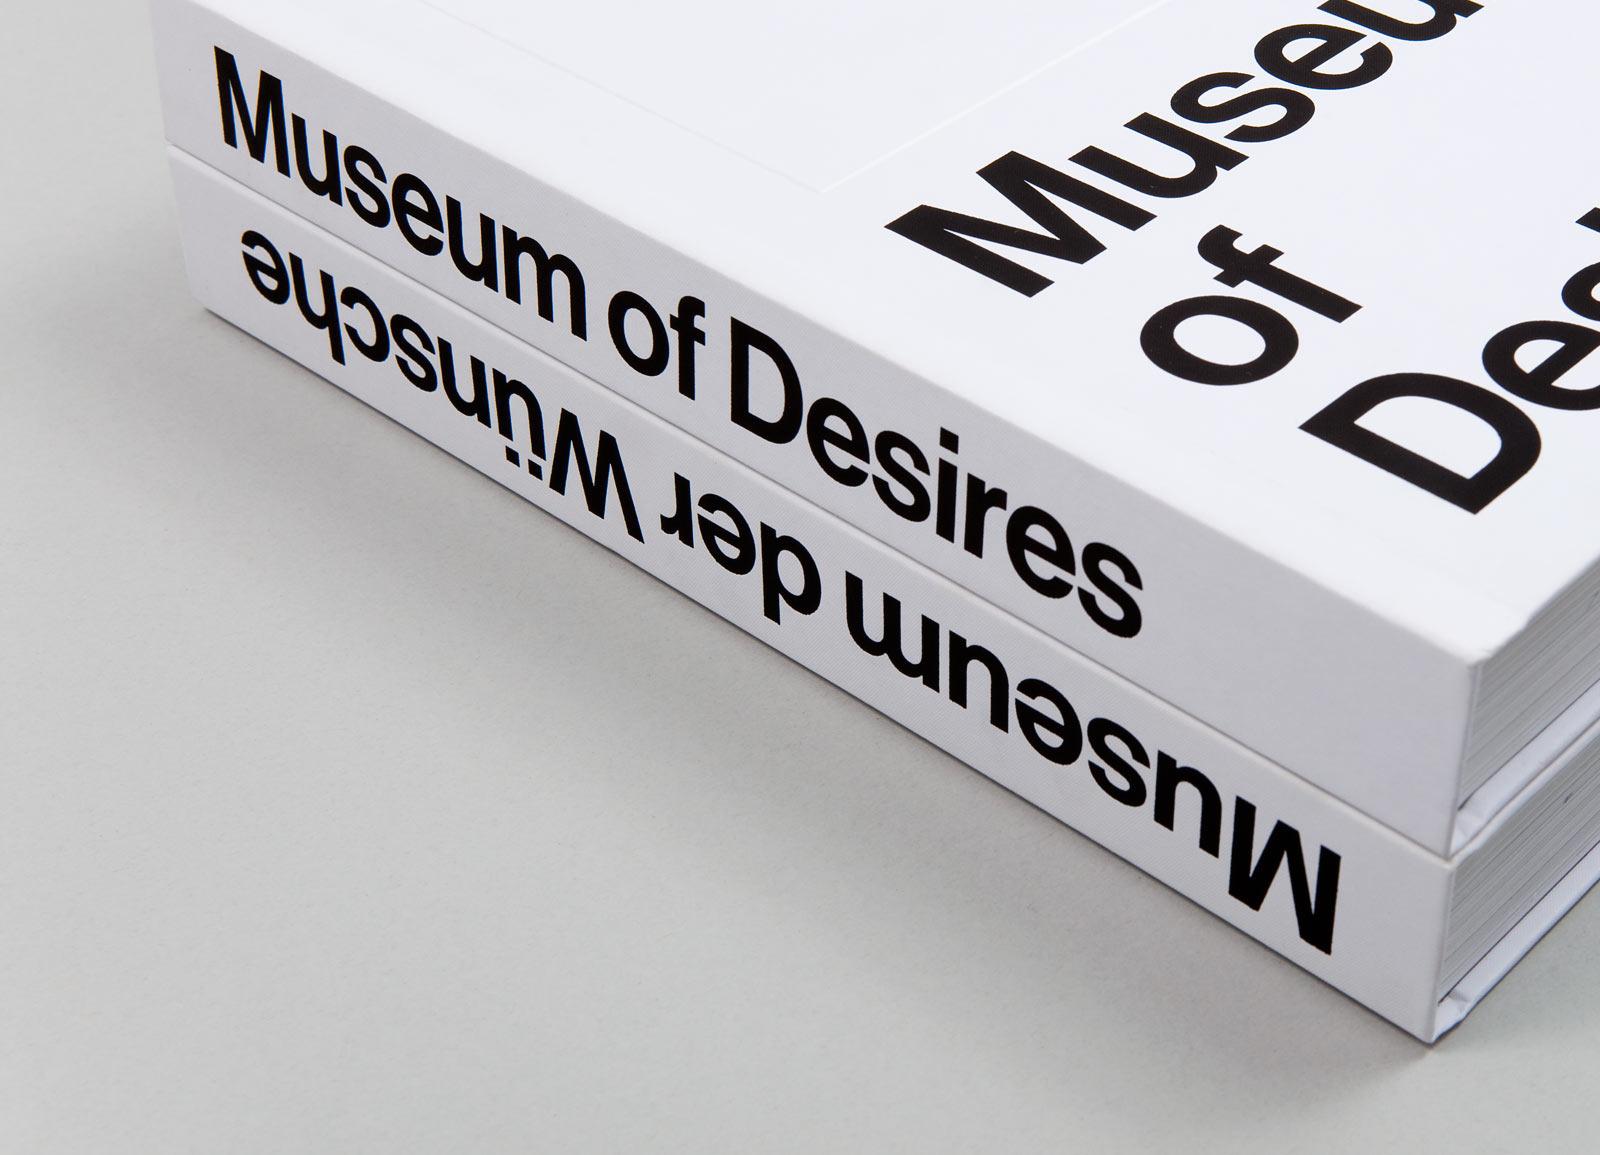 Museum of desires — Carvalho Bernau